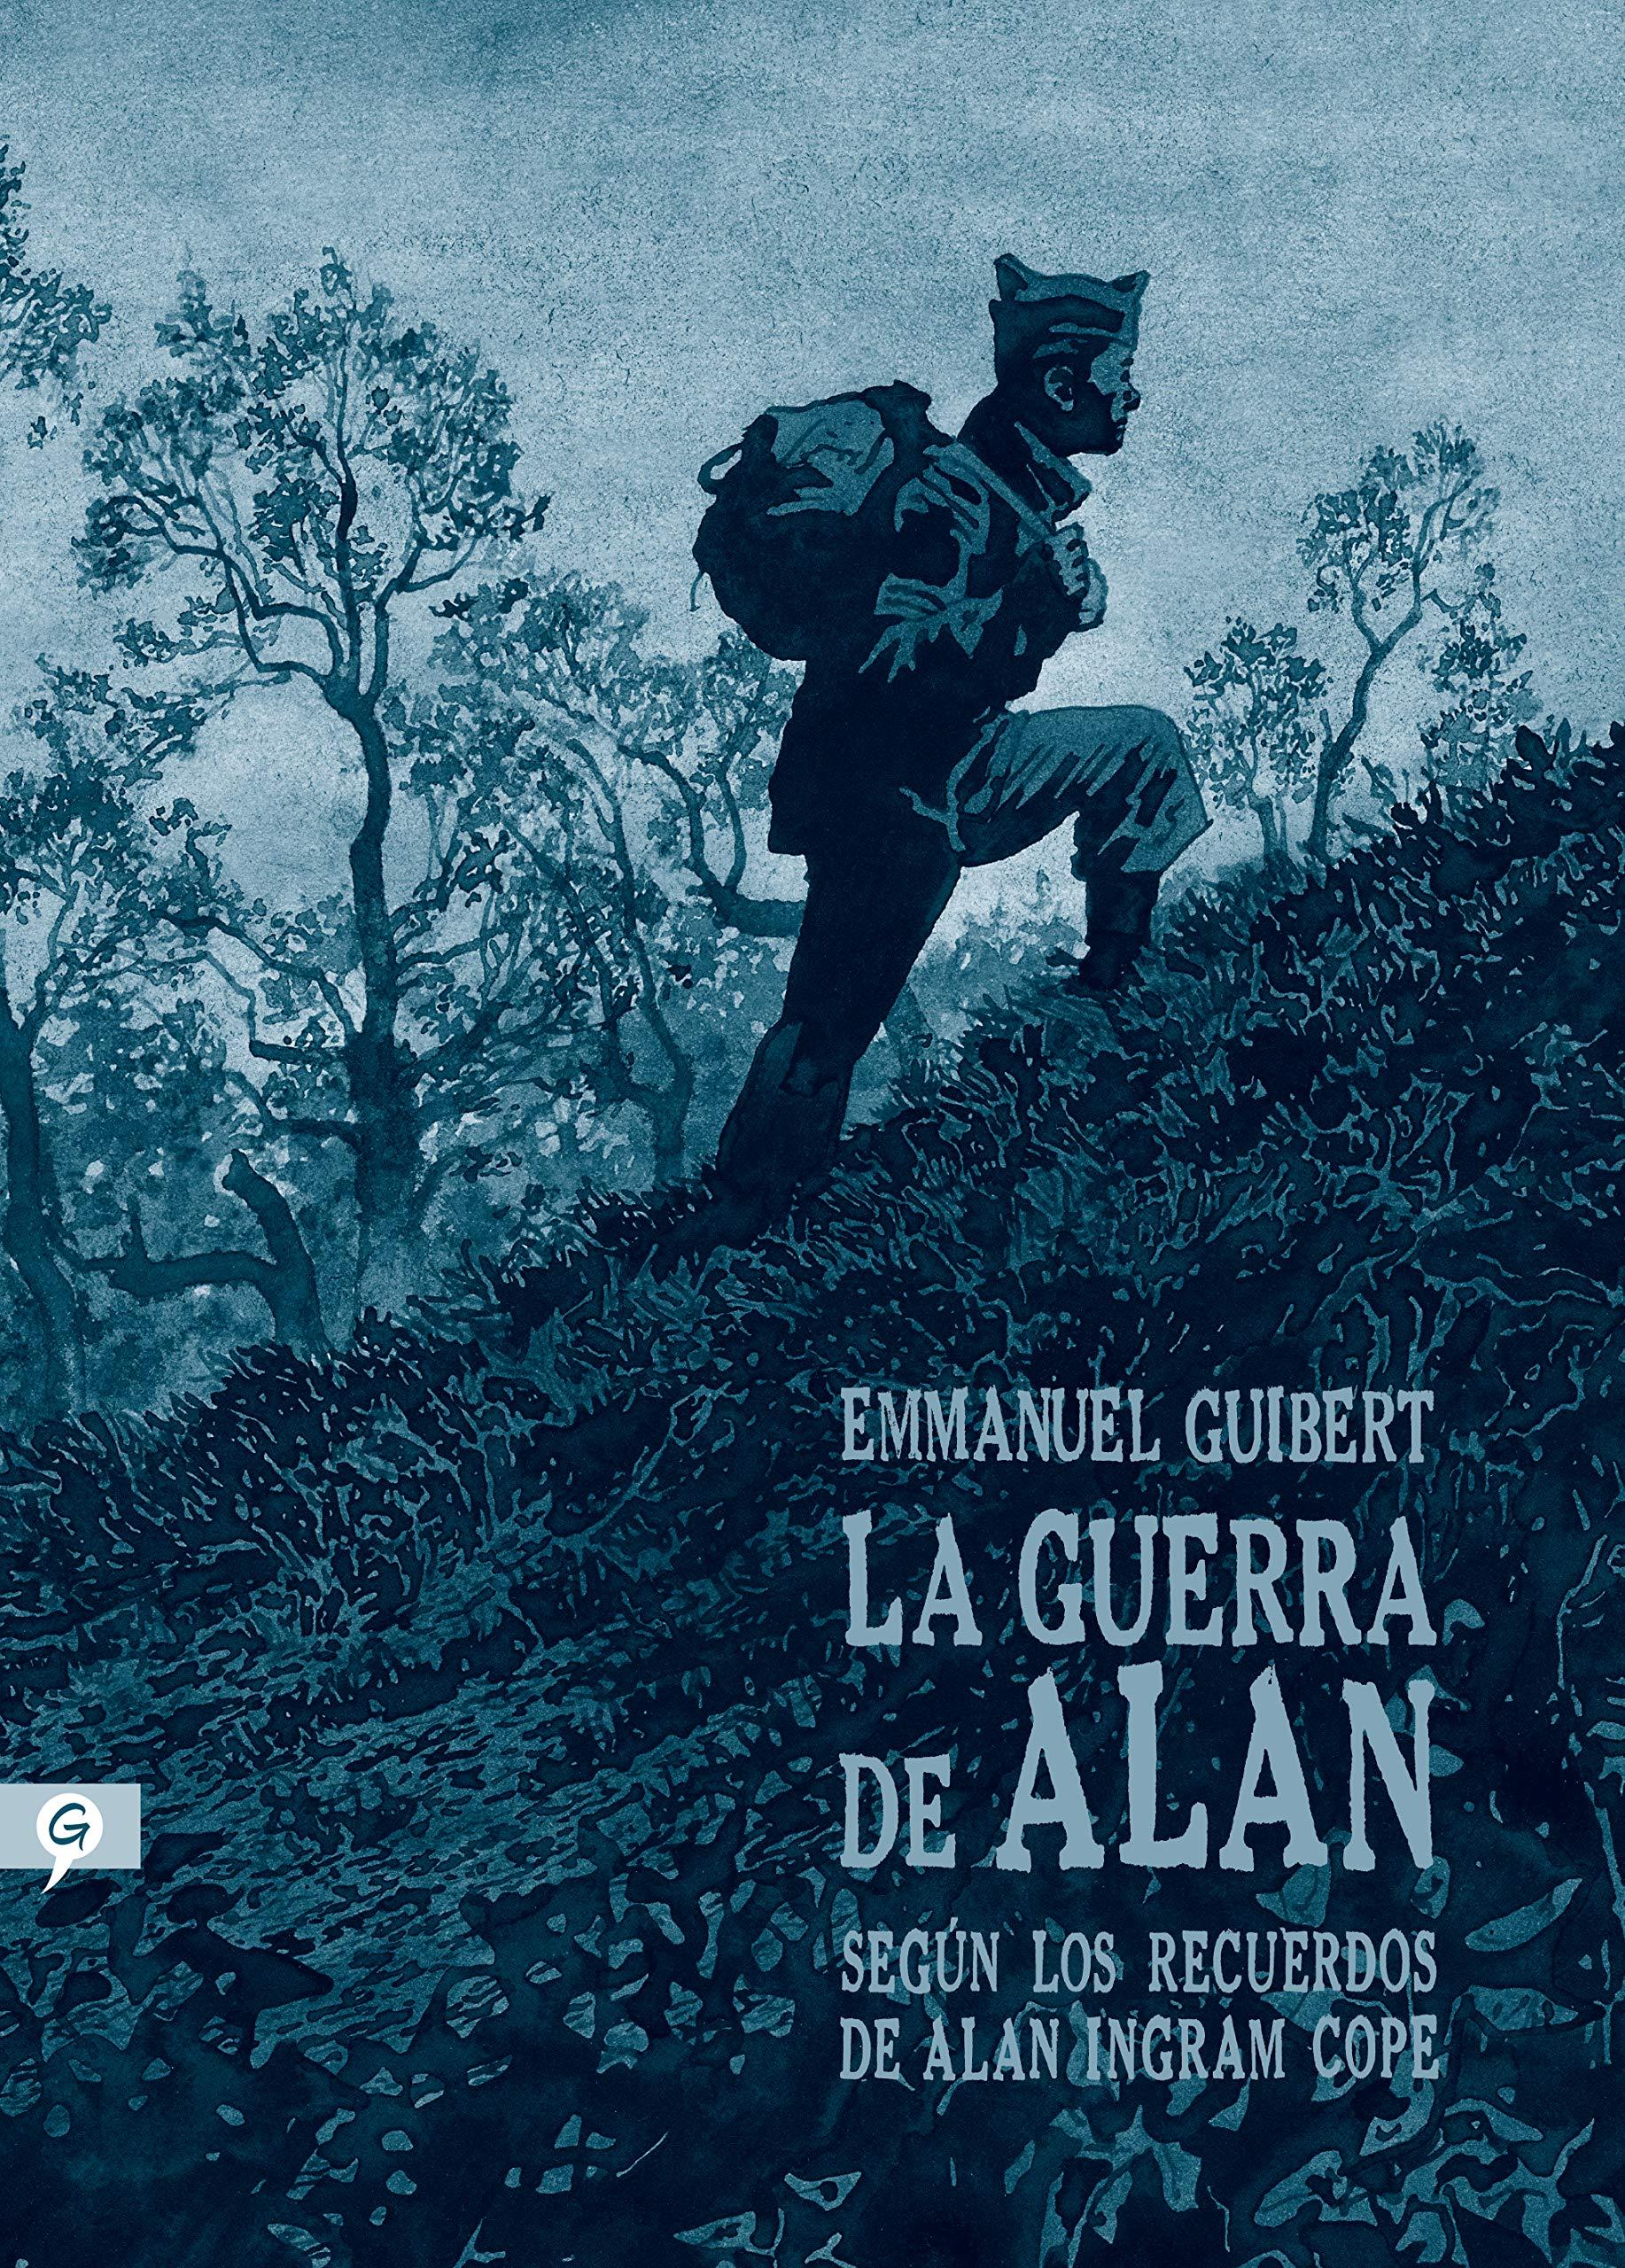 "Resultado de imagen de Emmanuel guibert l'association"""